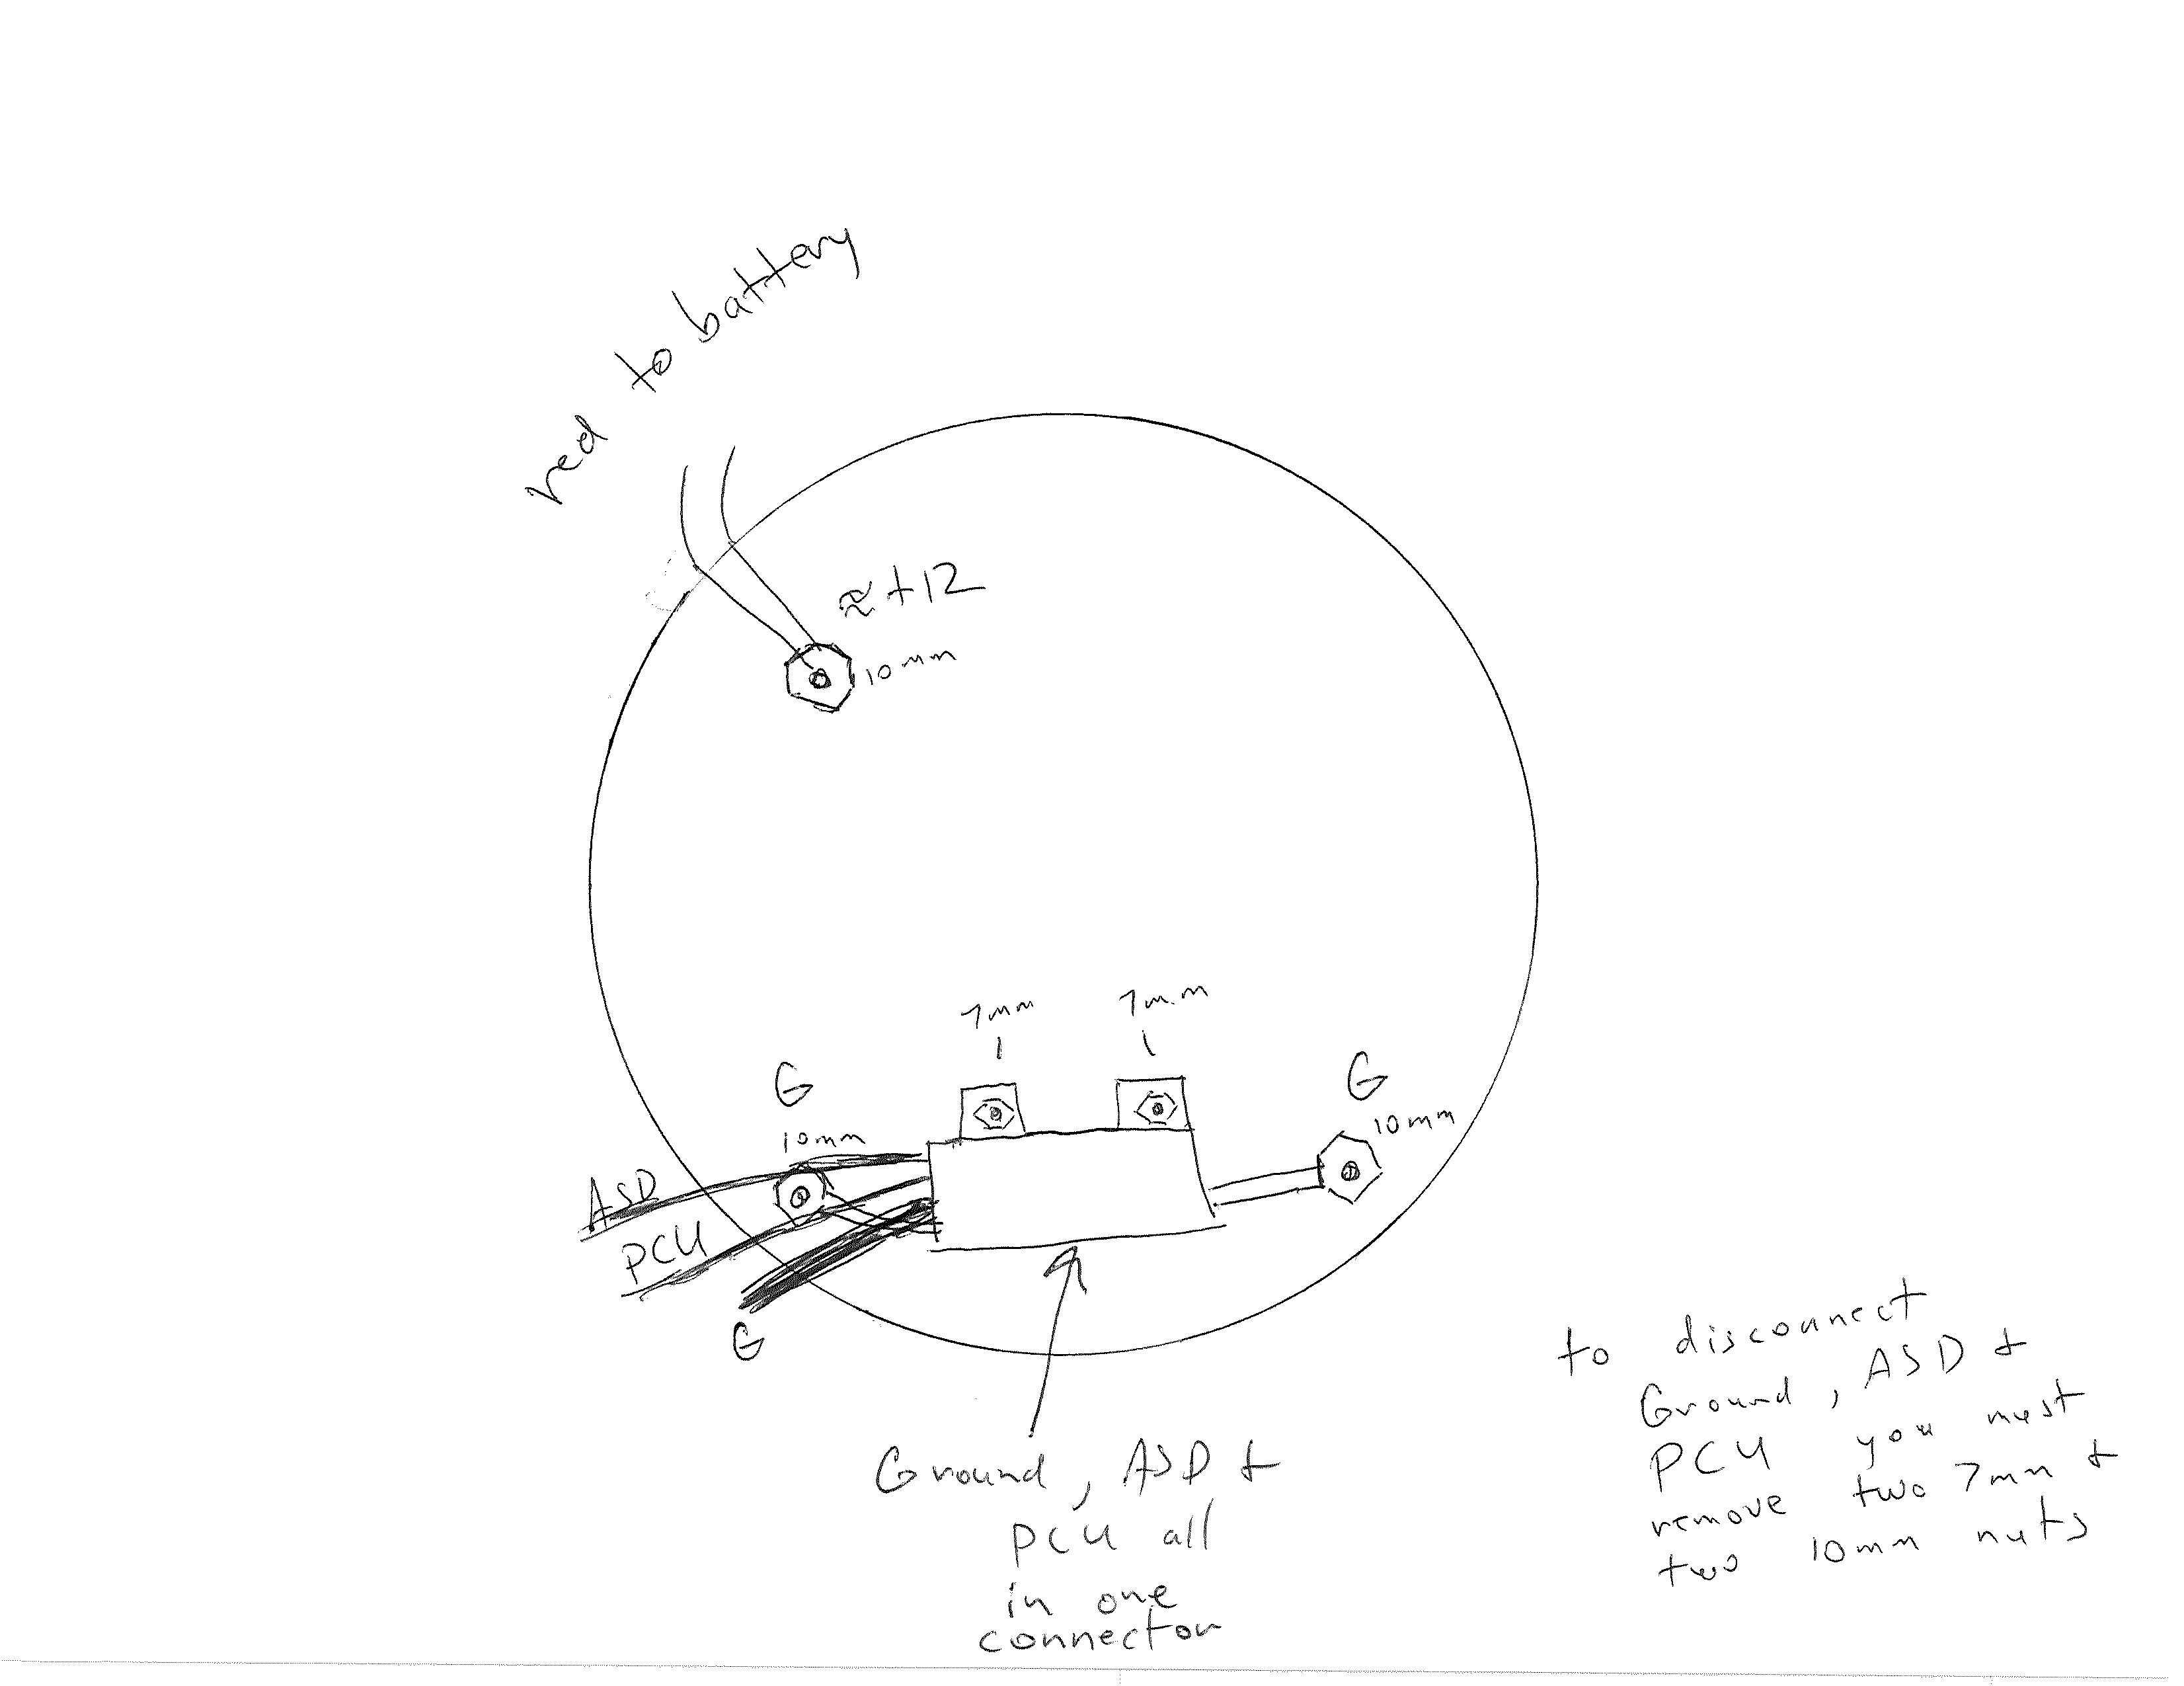 95 jeep grand cherokee laredo wiring diagram trailer brake 4 pin 1995 door harness 44